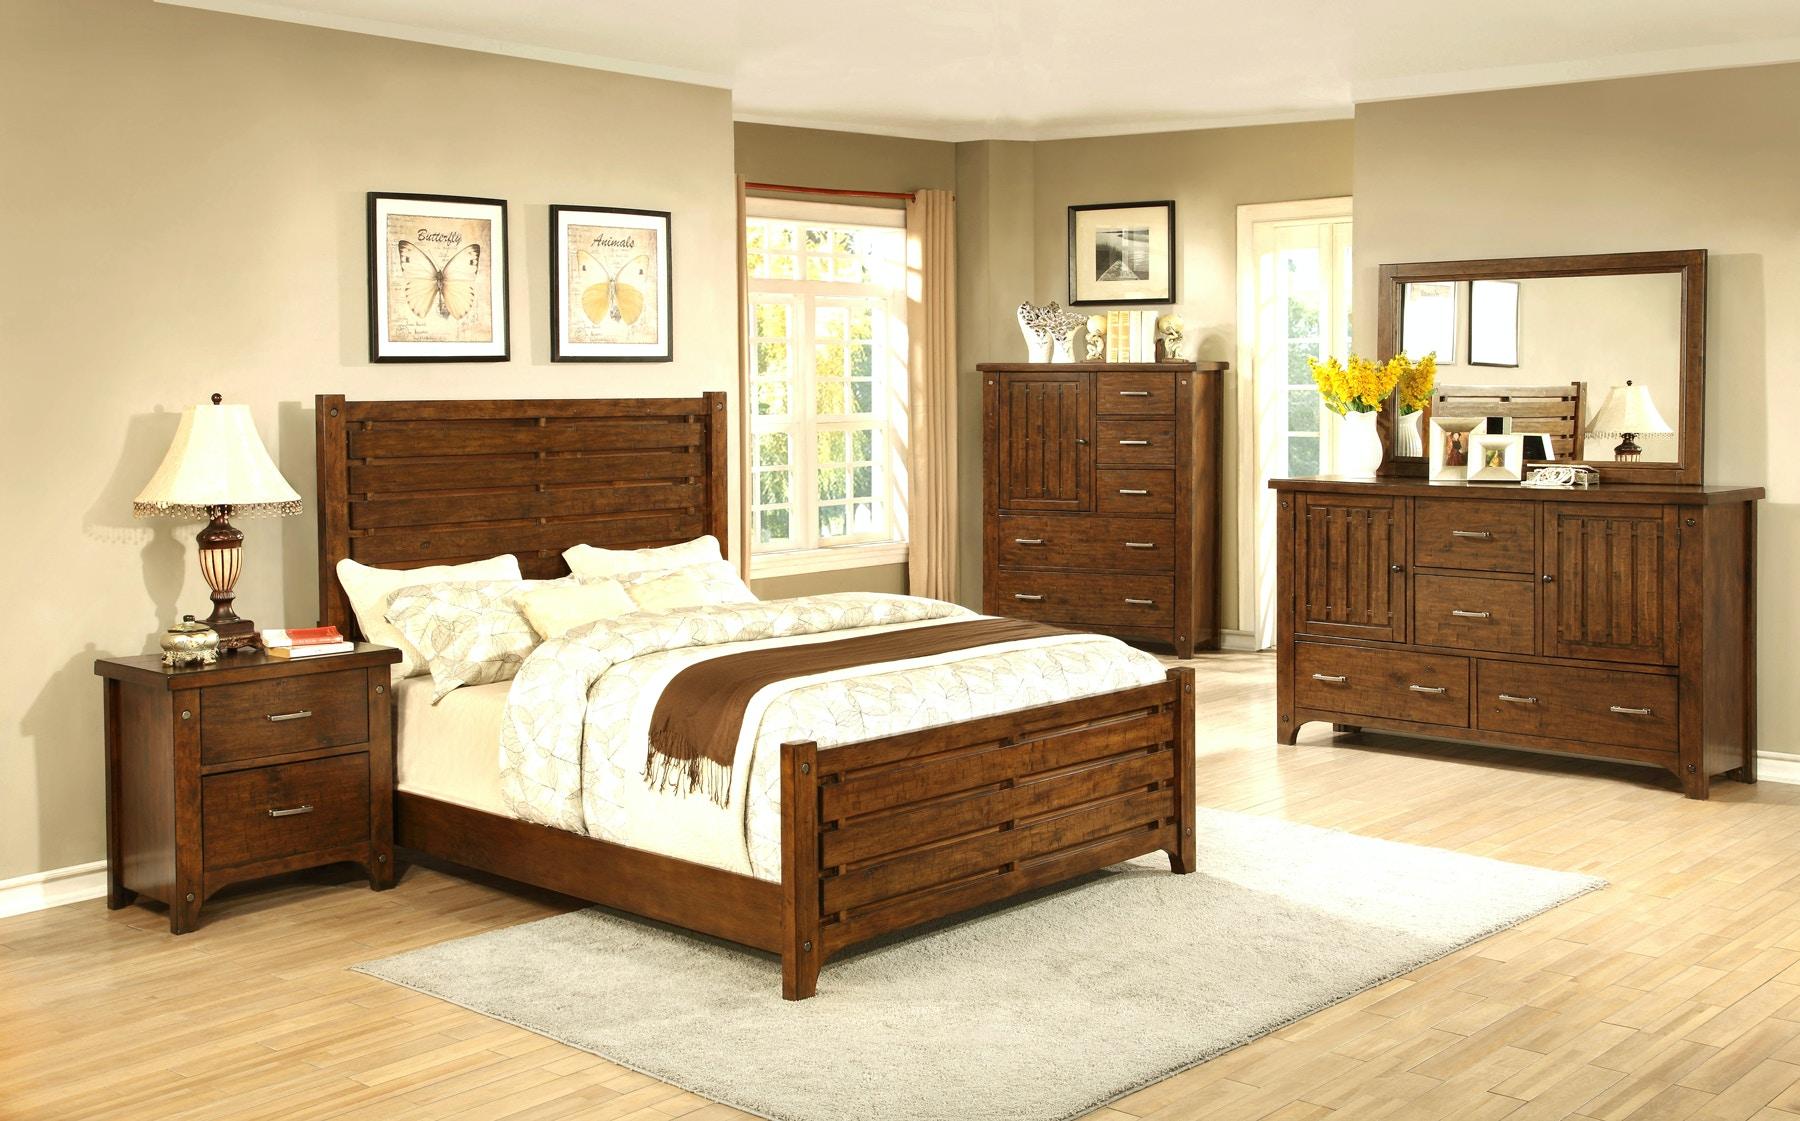 Holland House Mustang Bedroom Group   Queen 670614